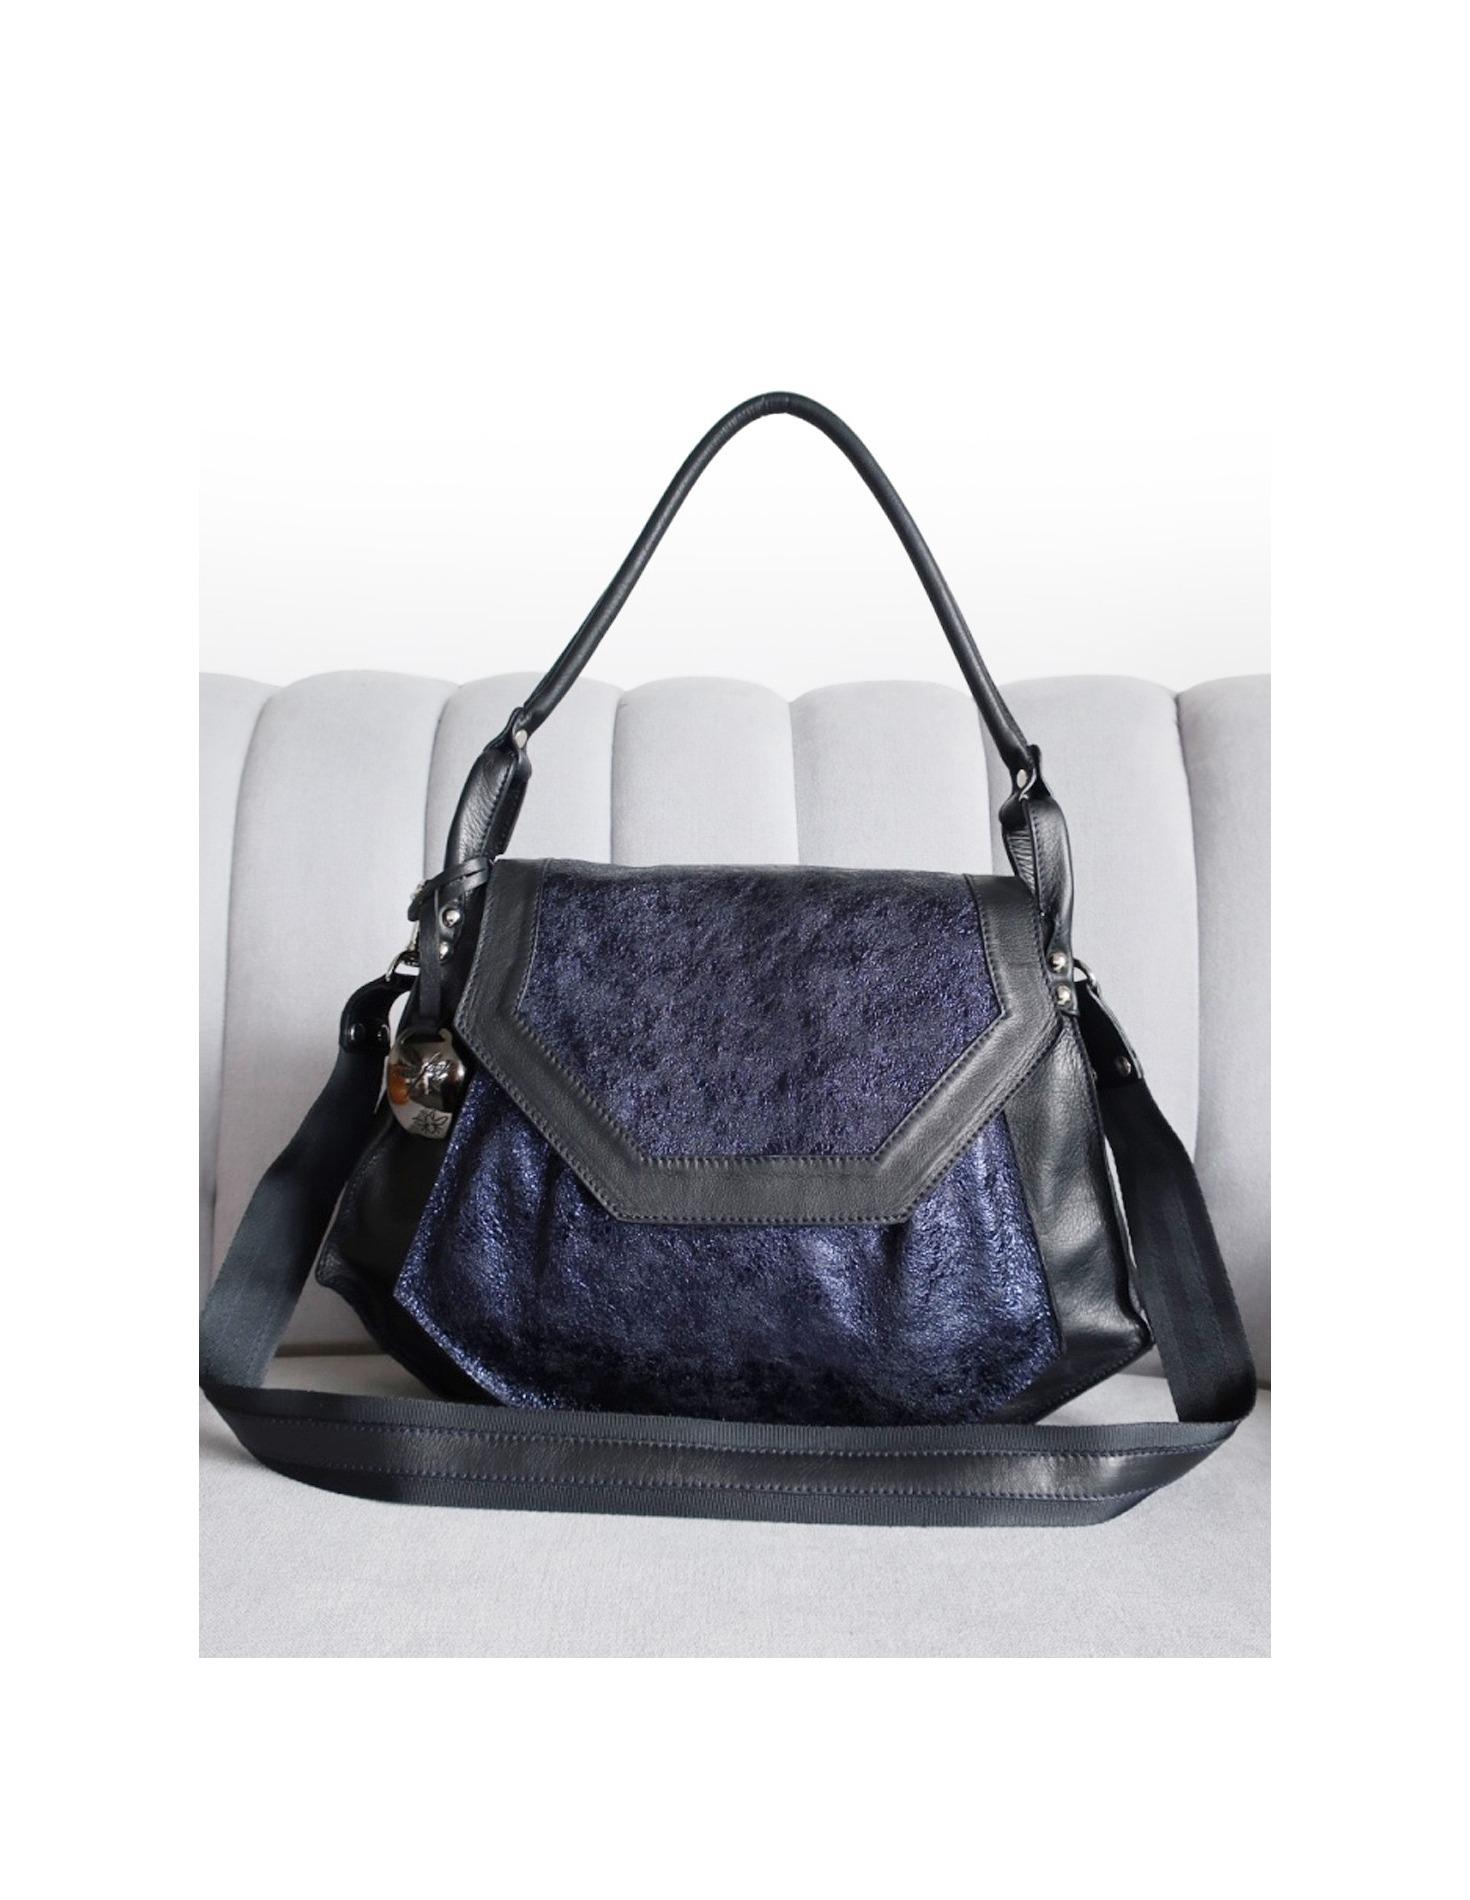 Olivia bag in Black and Navy. Loading zoom e54aebfda9c47